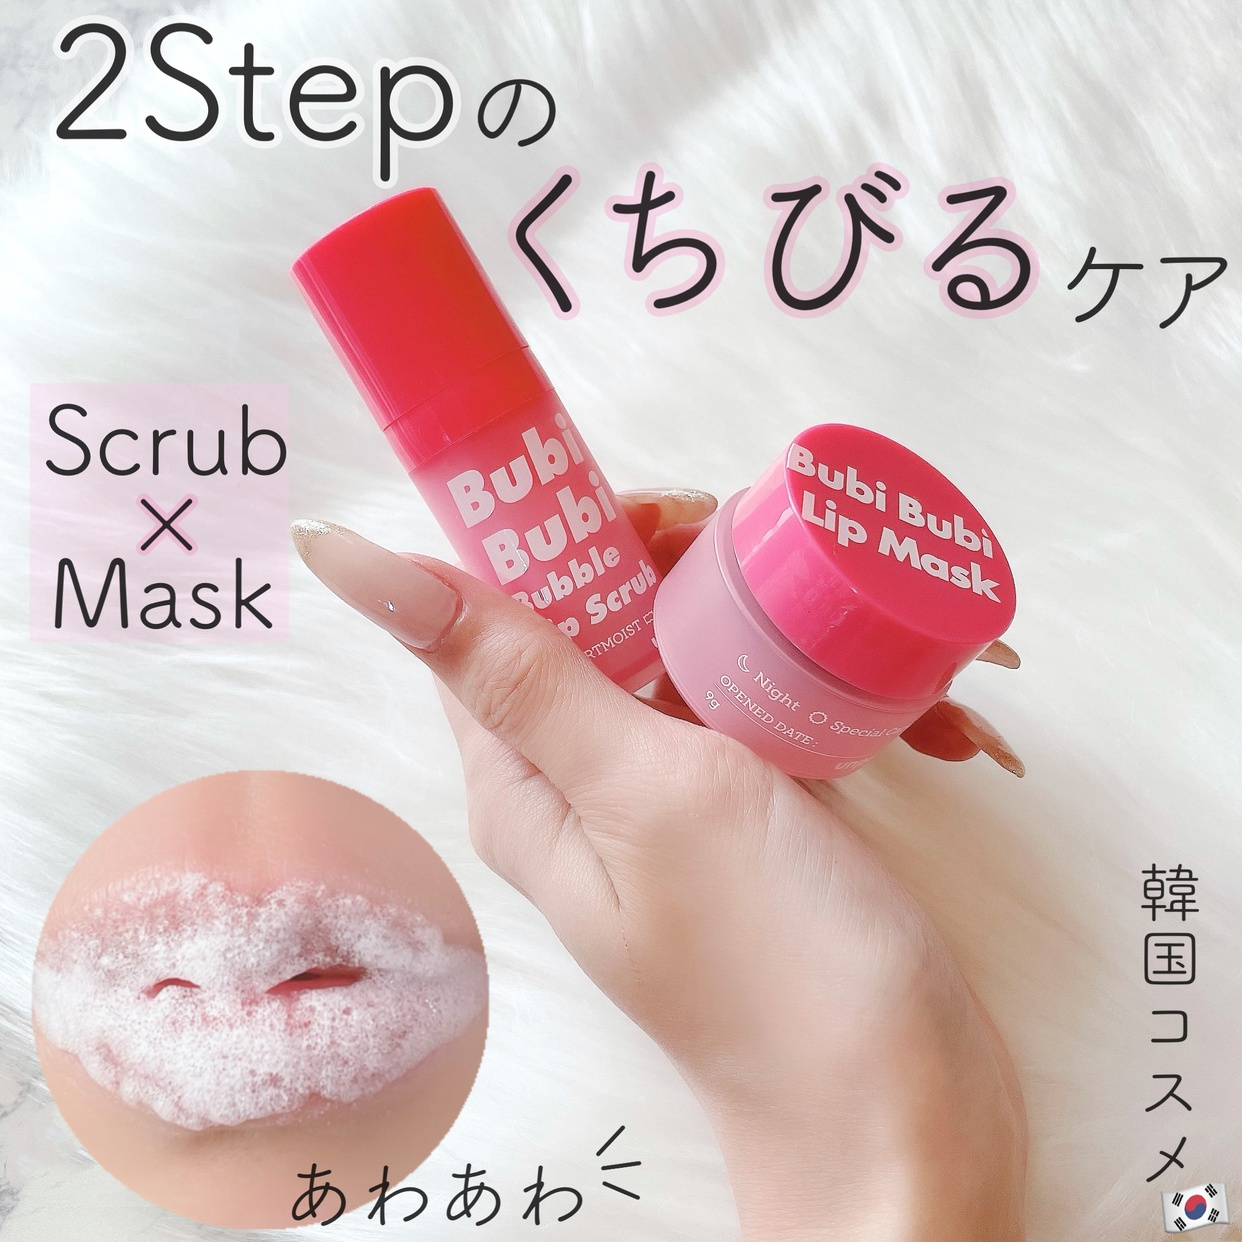 unpa.Cosmetics(オンパコスメティック)ブビブビリップ スクラブを使ったshiroさんのクチコミ画像1